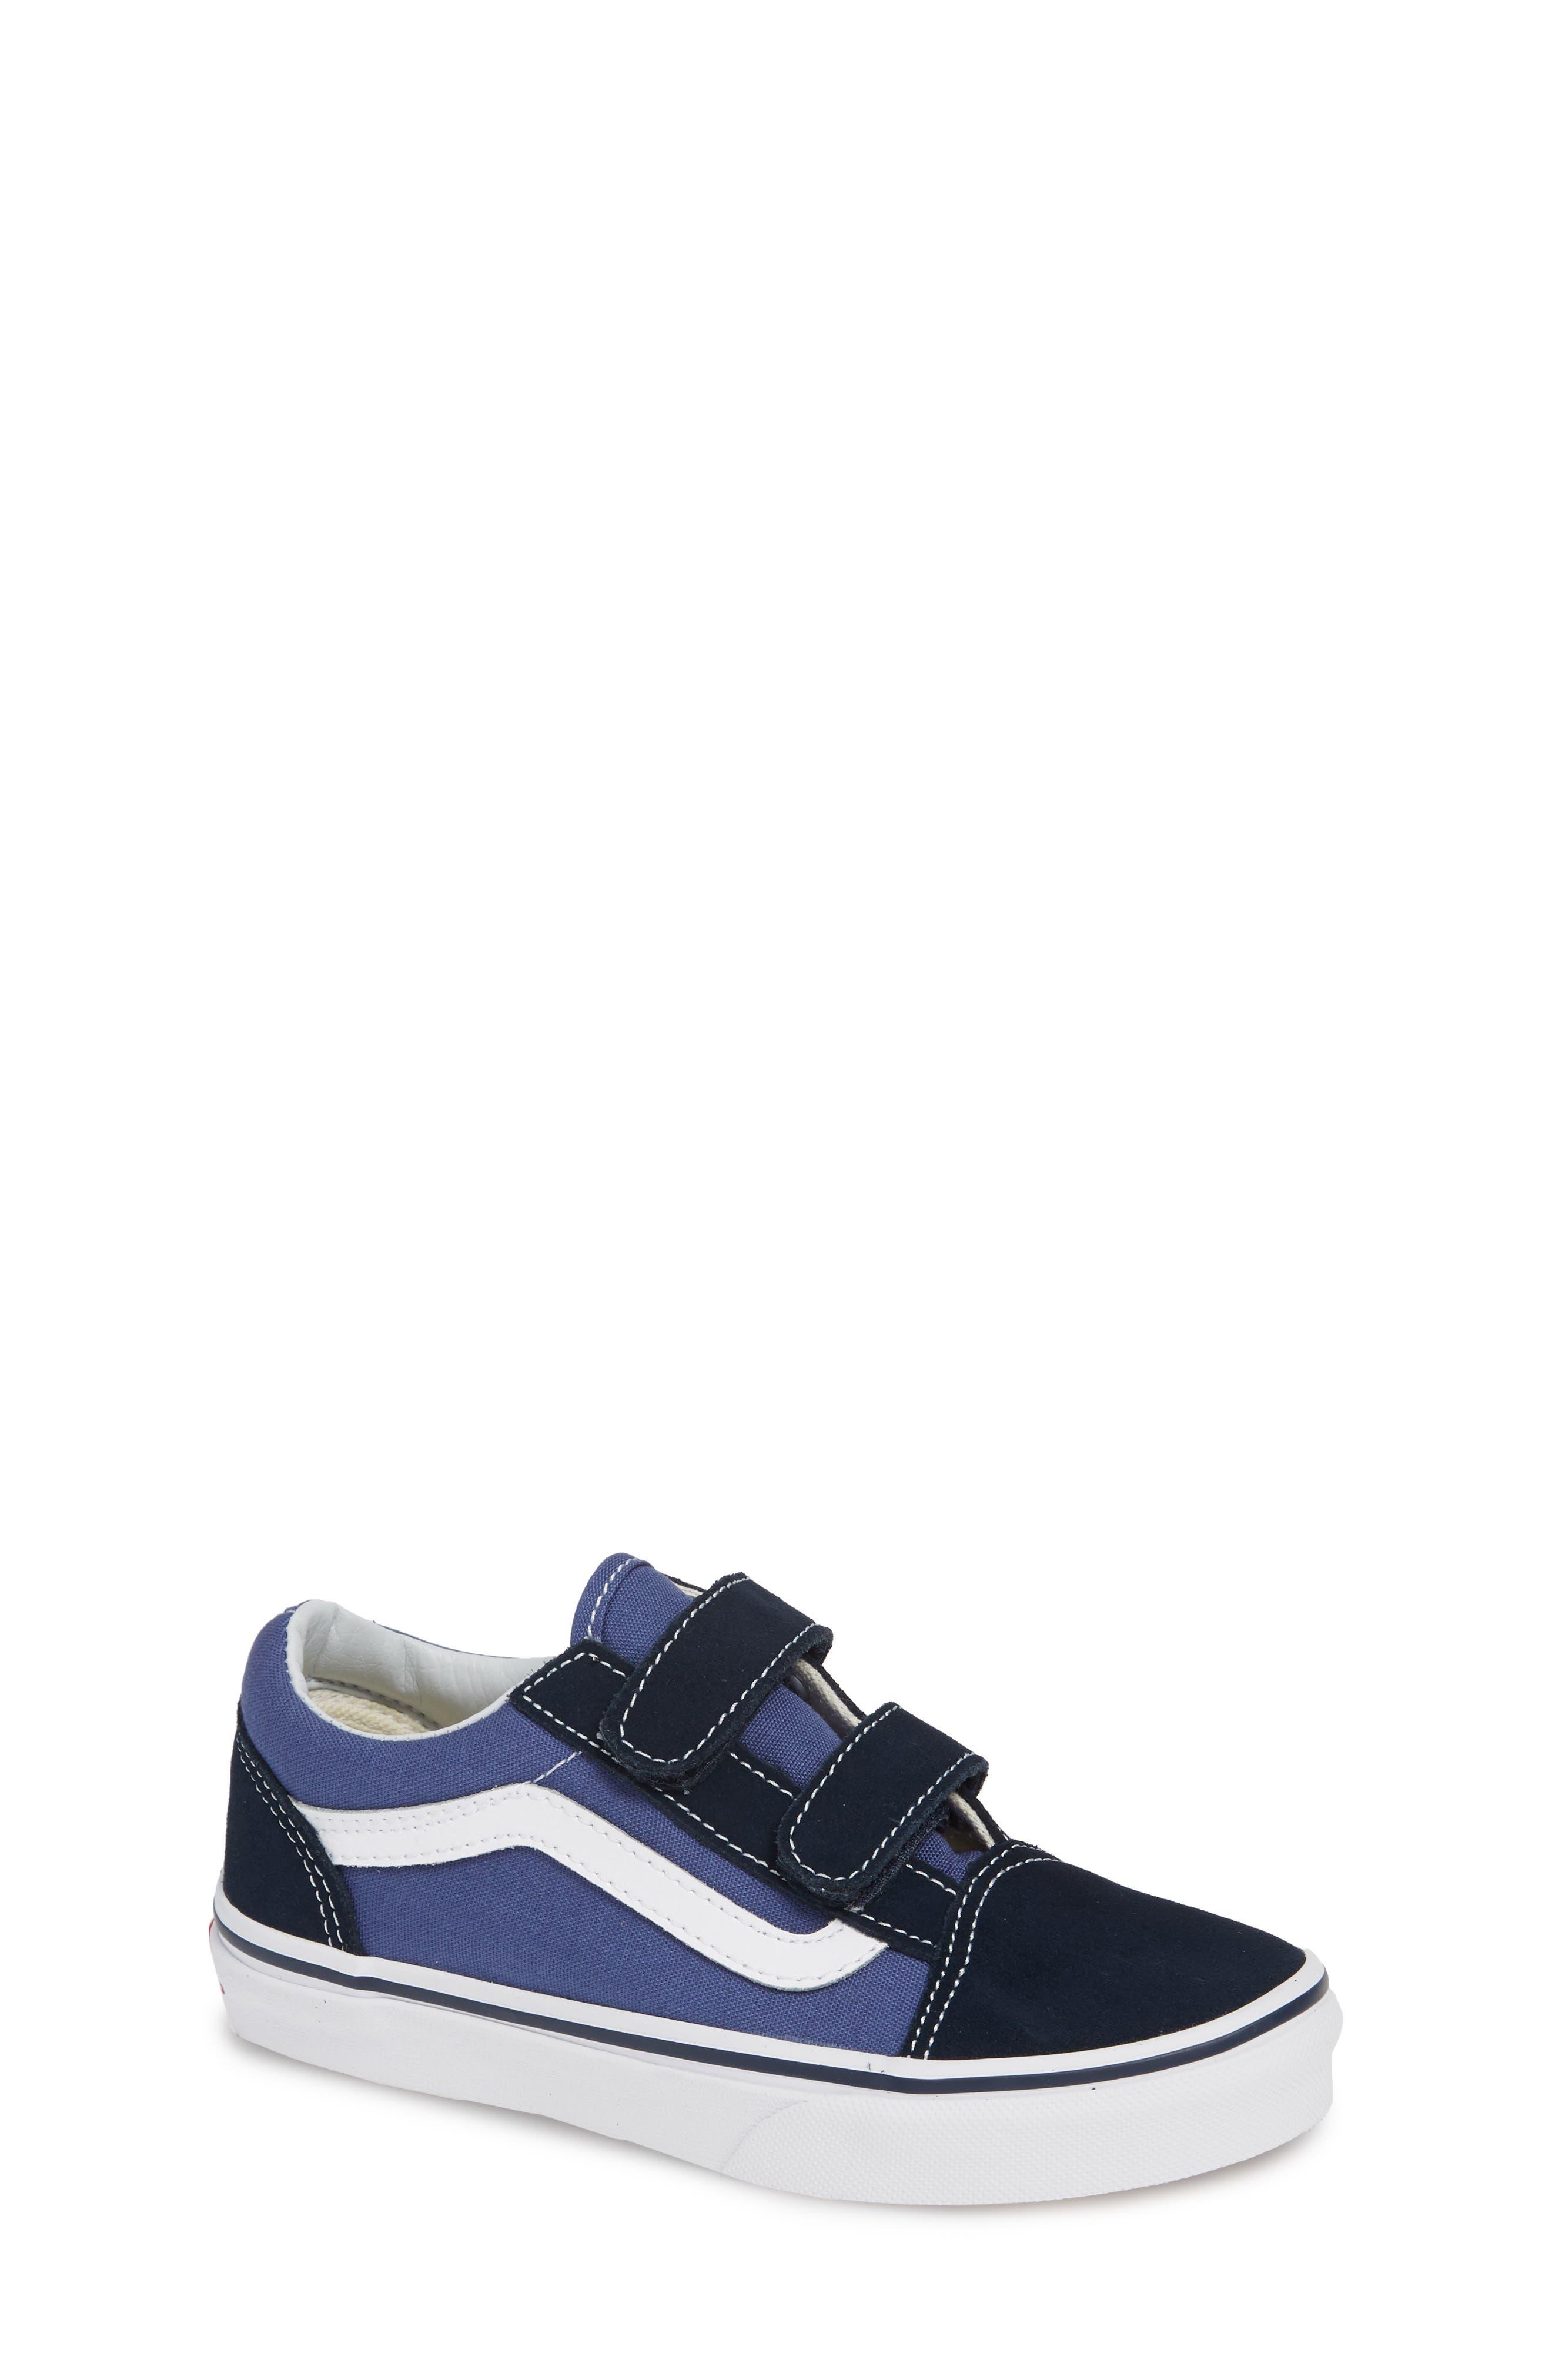 Old Skool V Sneaker,                         Main,                         color, NAVY/ TRUE WHITE